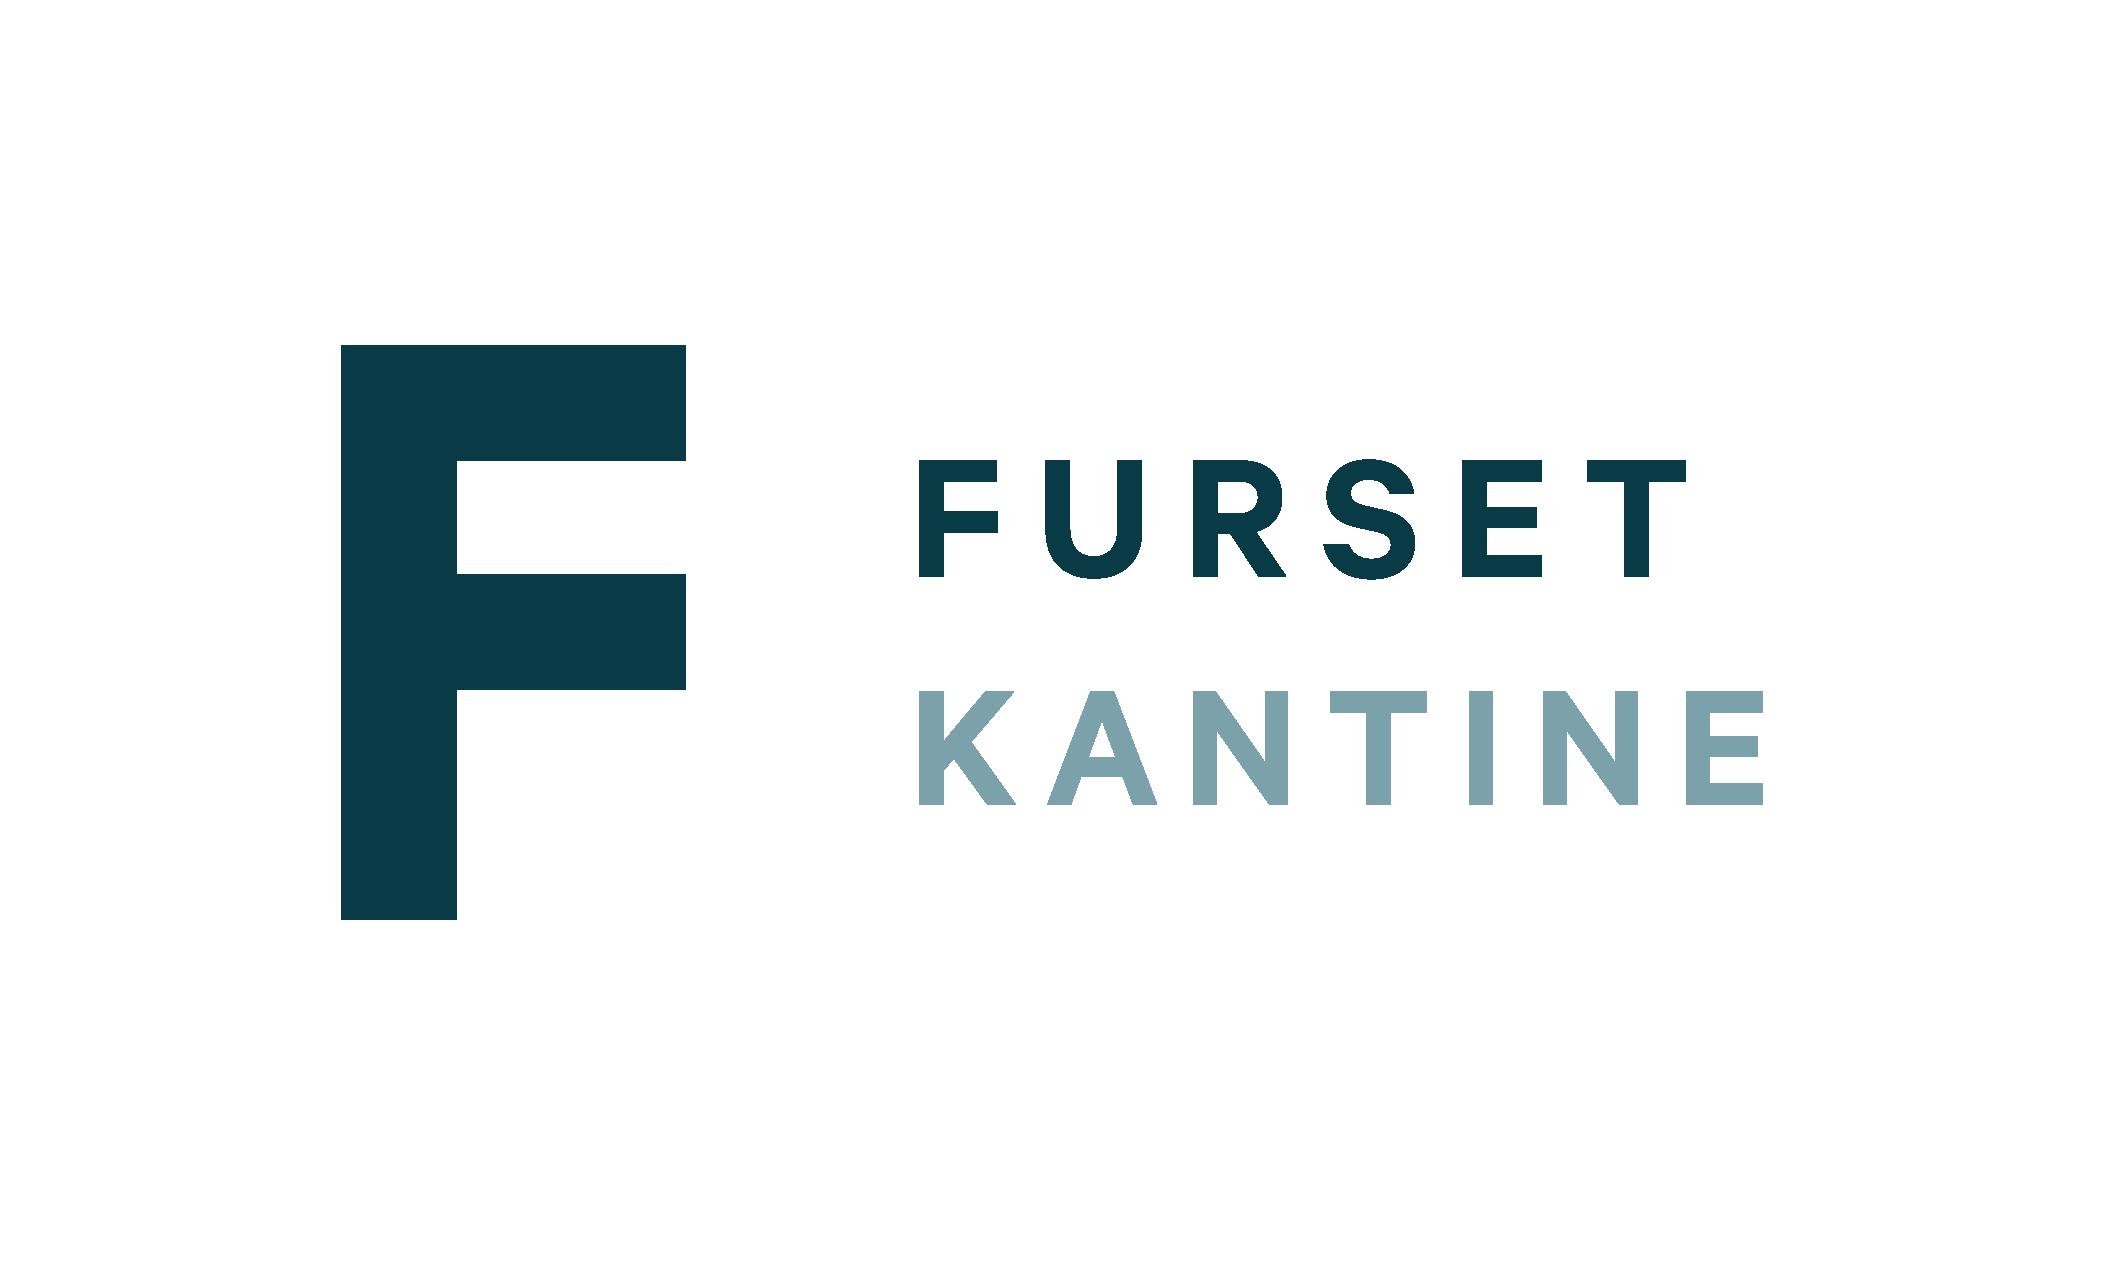 fg_kantine_symbol_horisontal_rgb_positiv